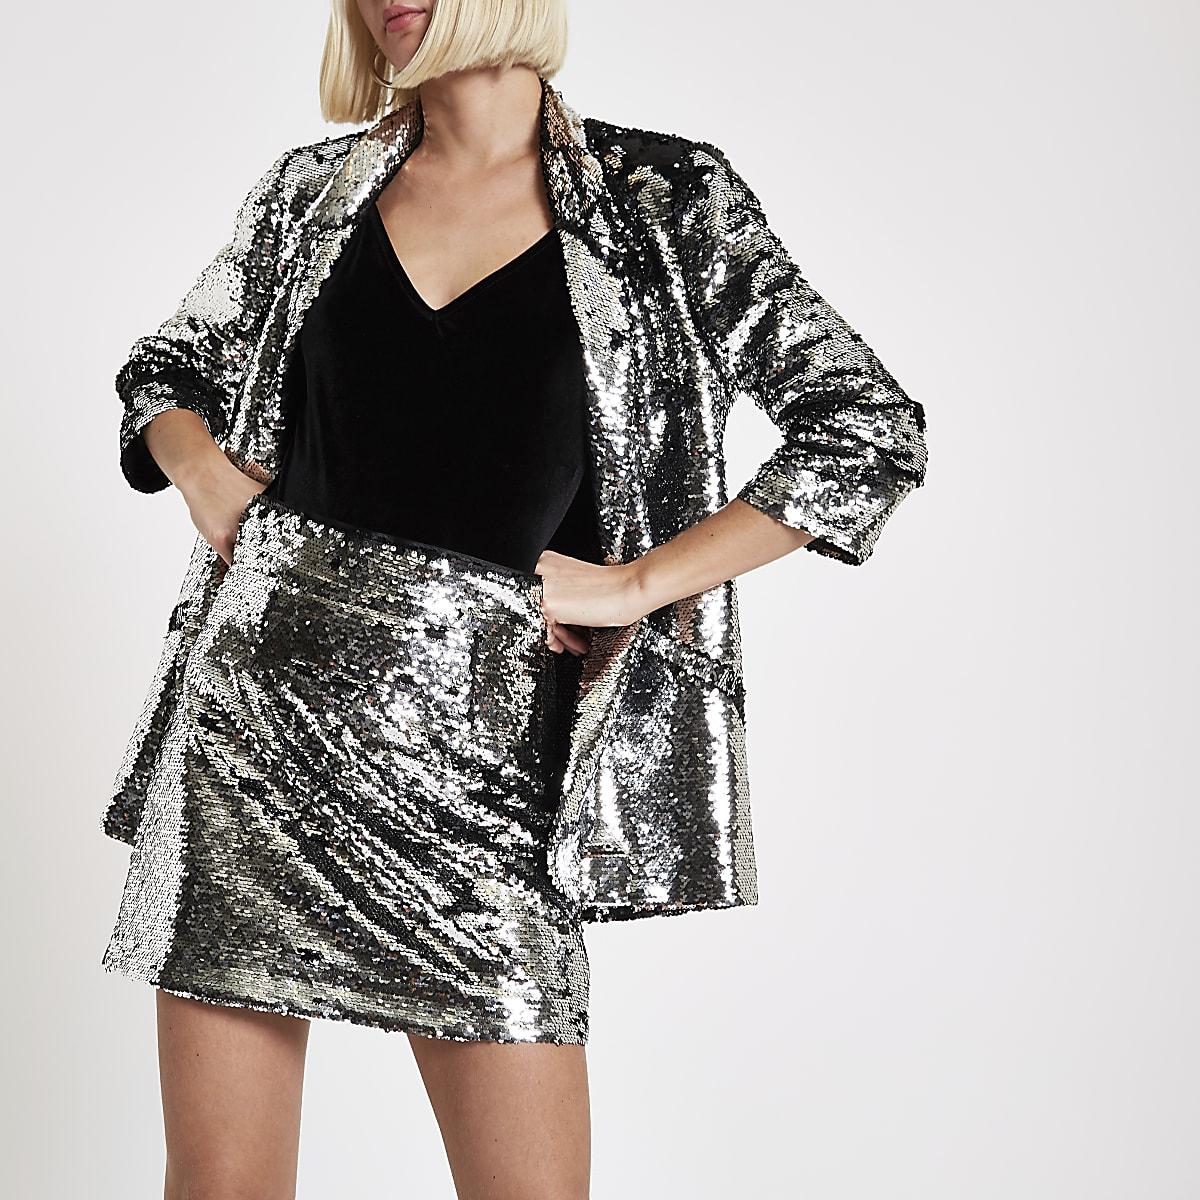 Silver sequin embellished mini skirt